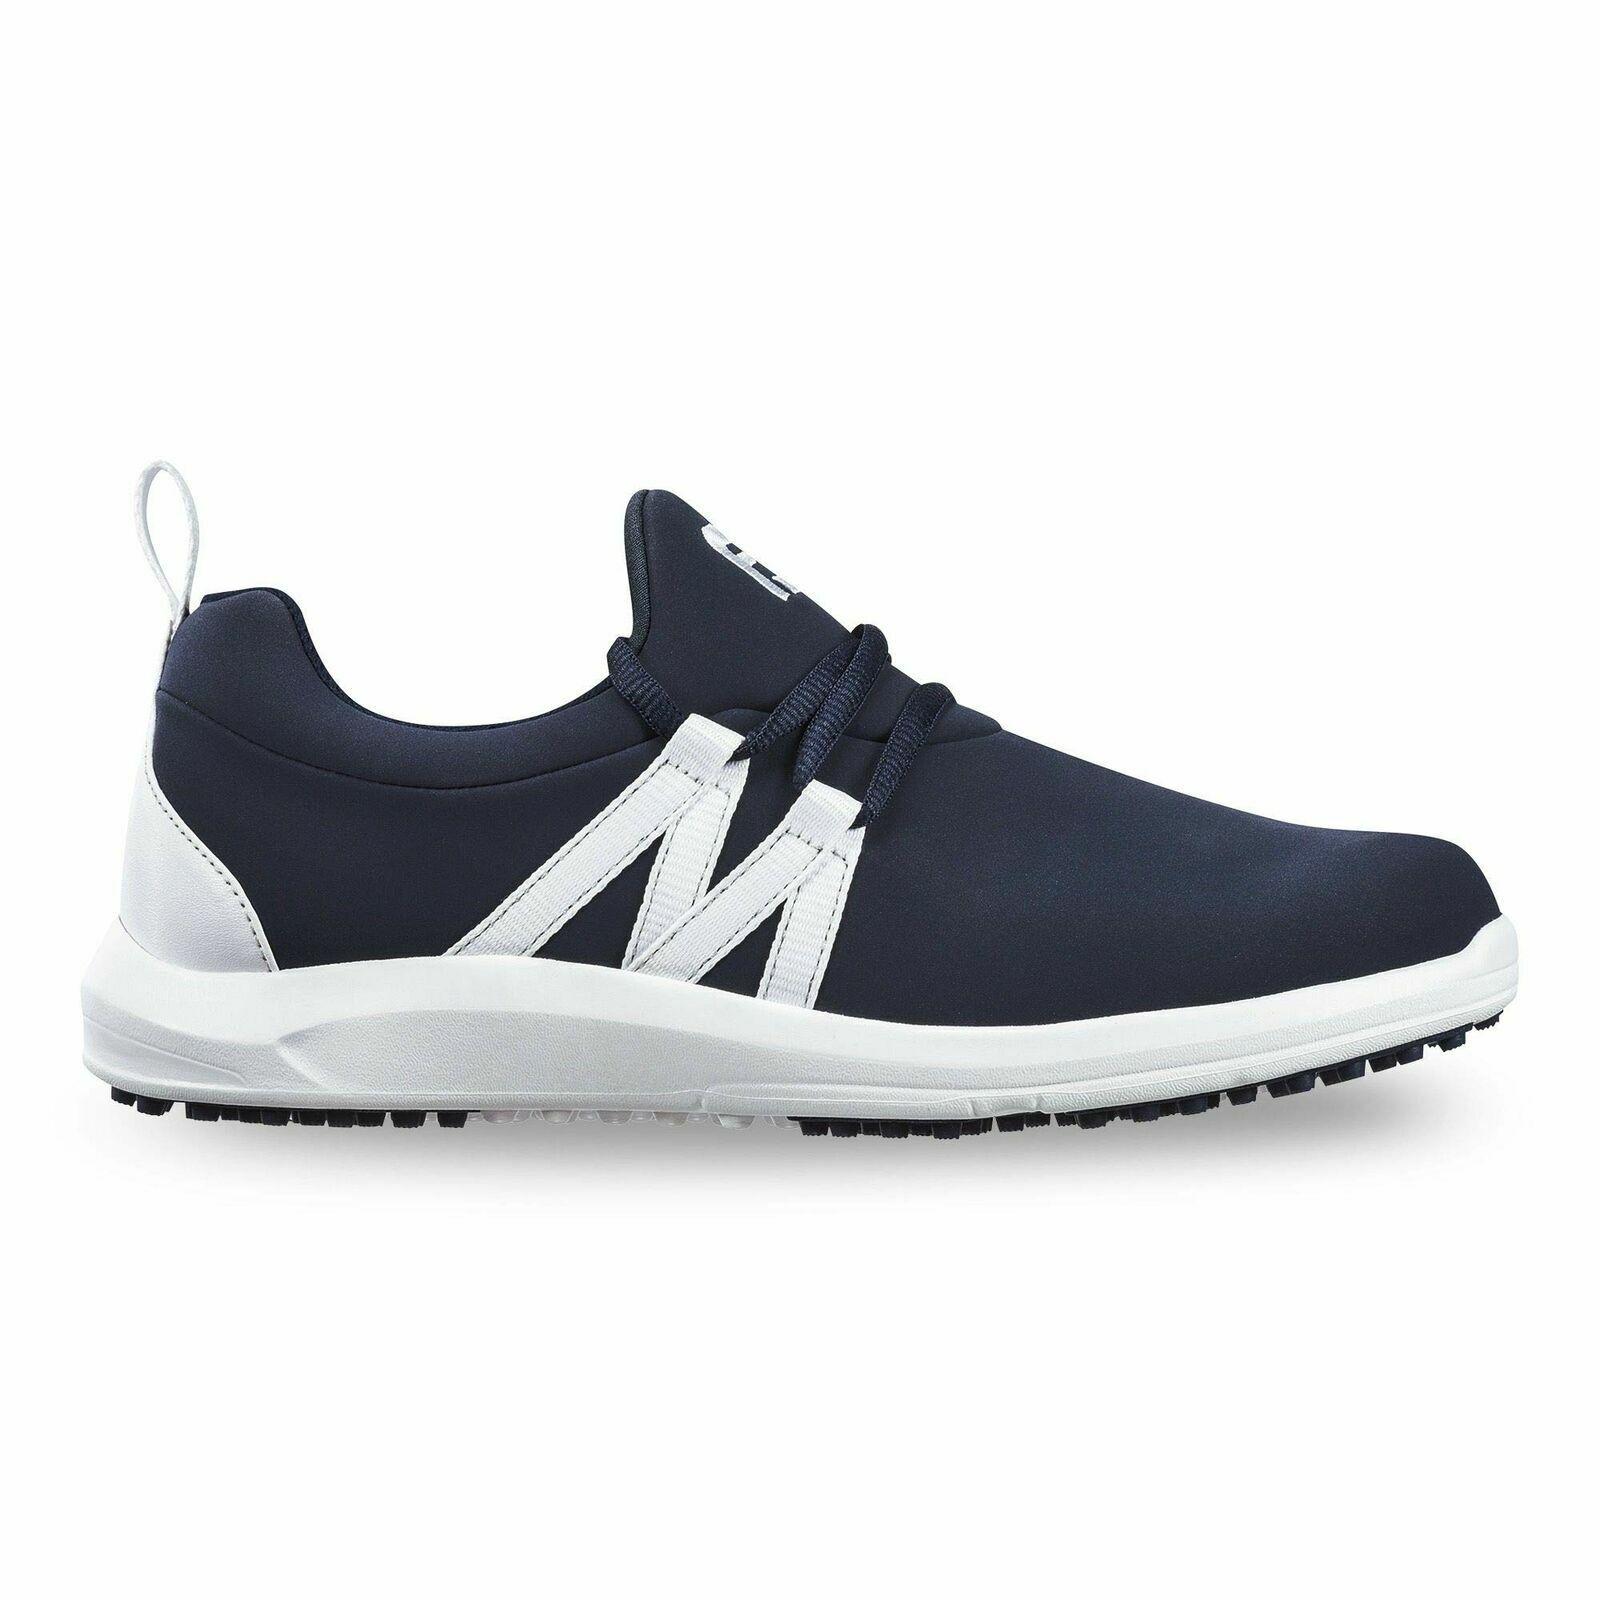 Brand New FootJoy Women's Fj Leisure Slip-on Golf Shoes - Choose Size